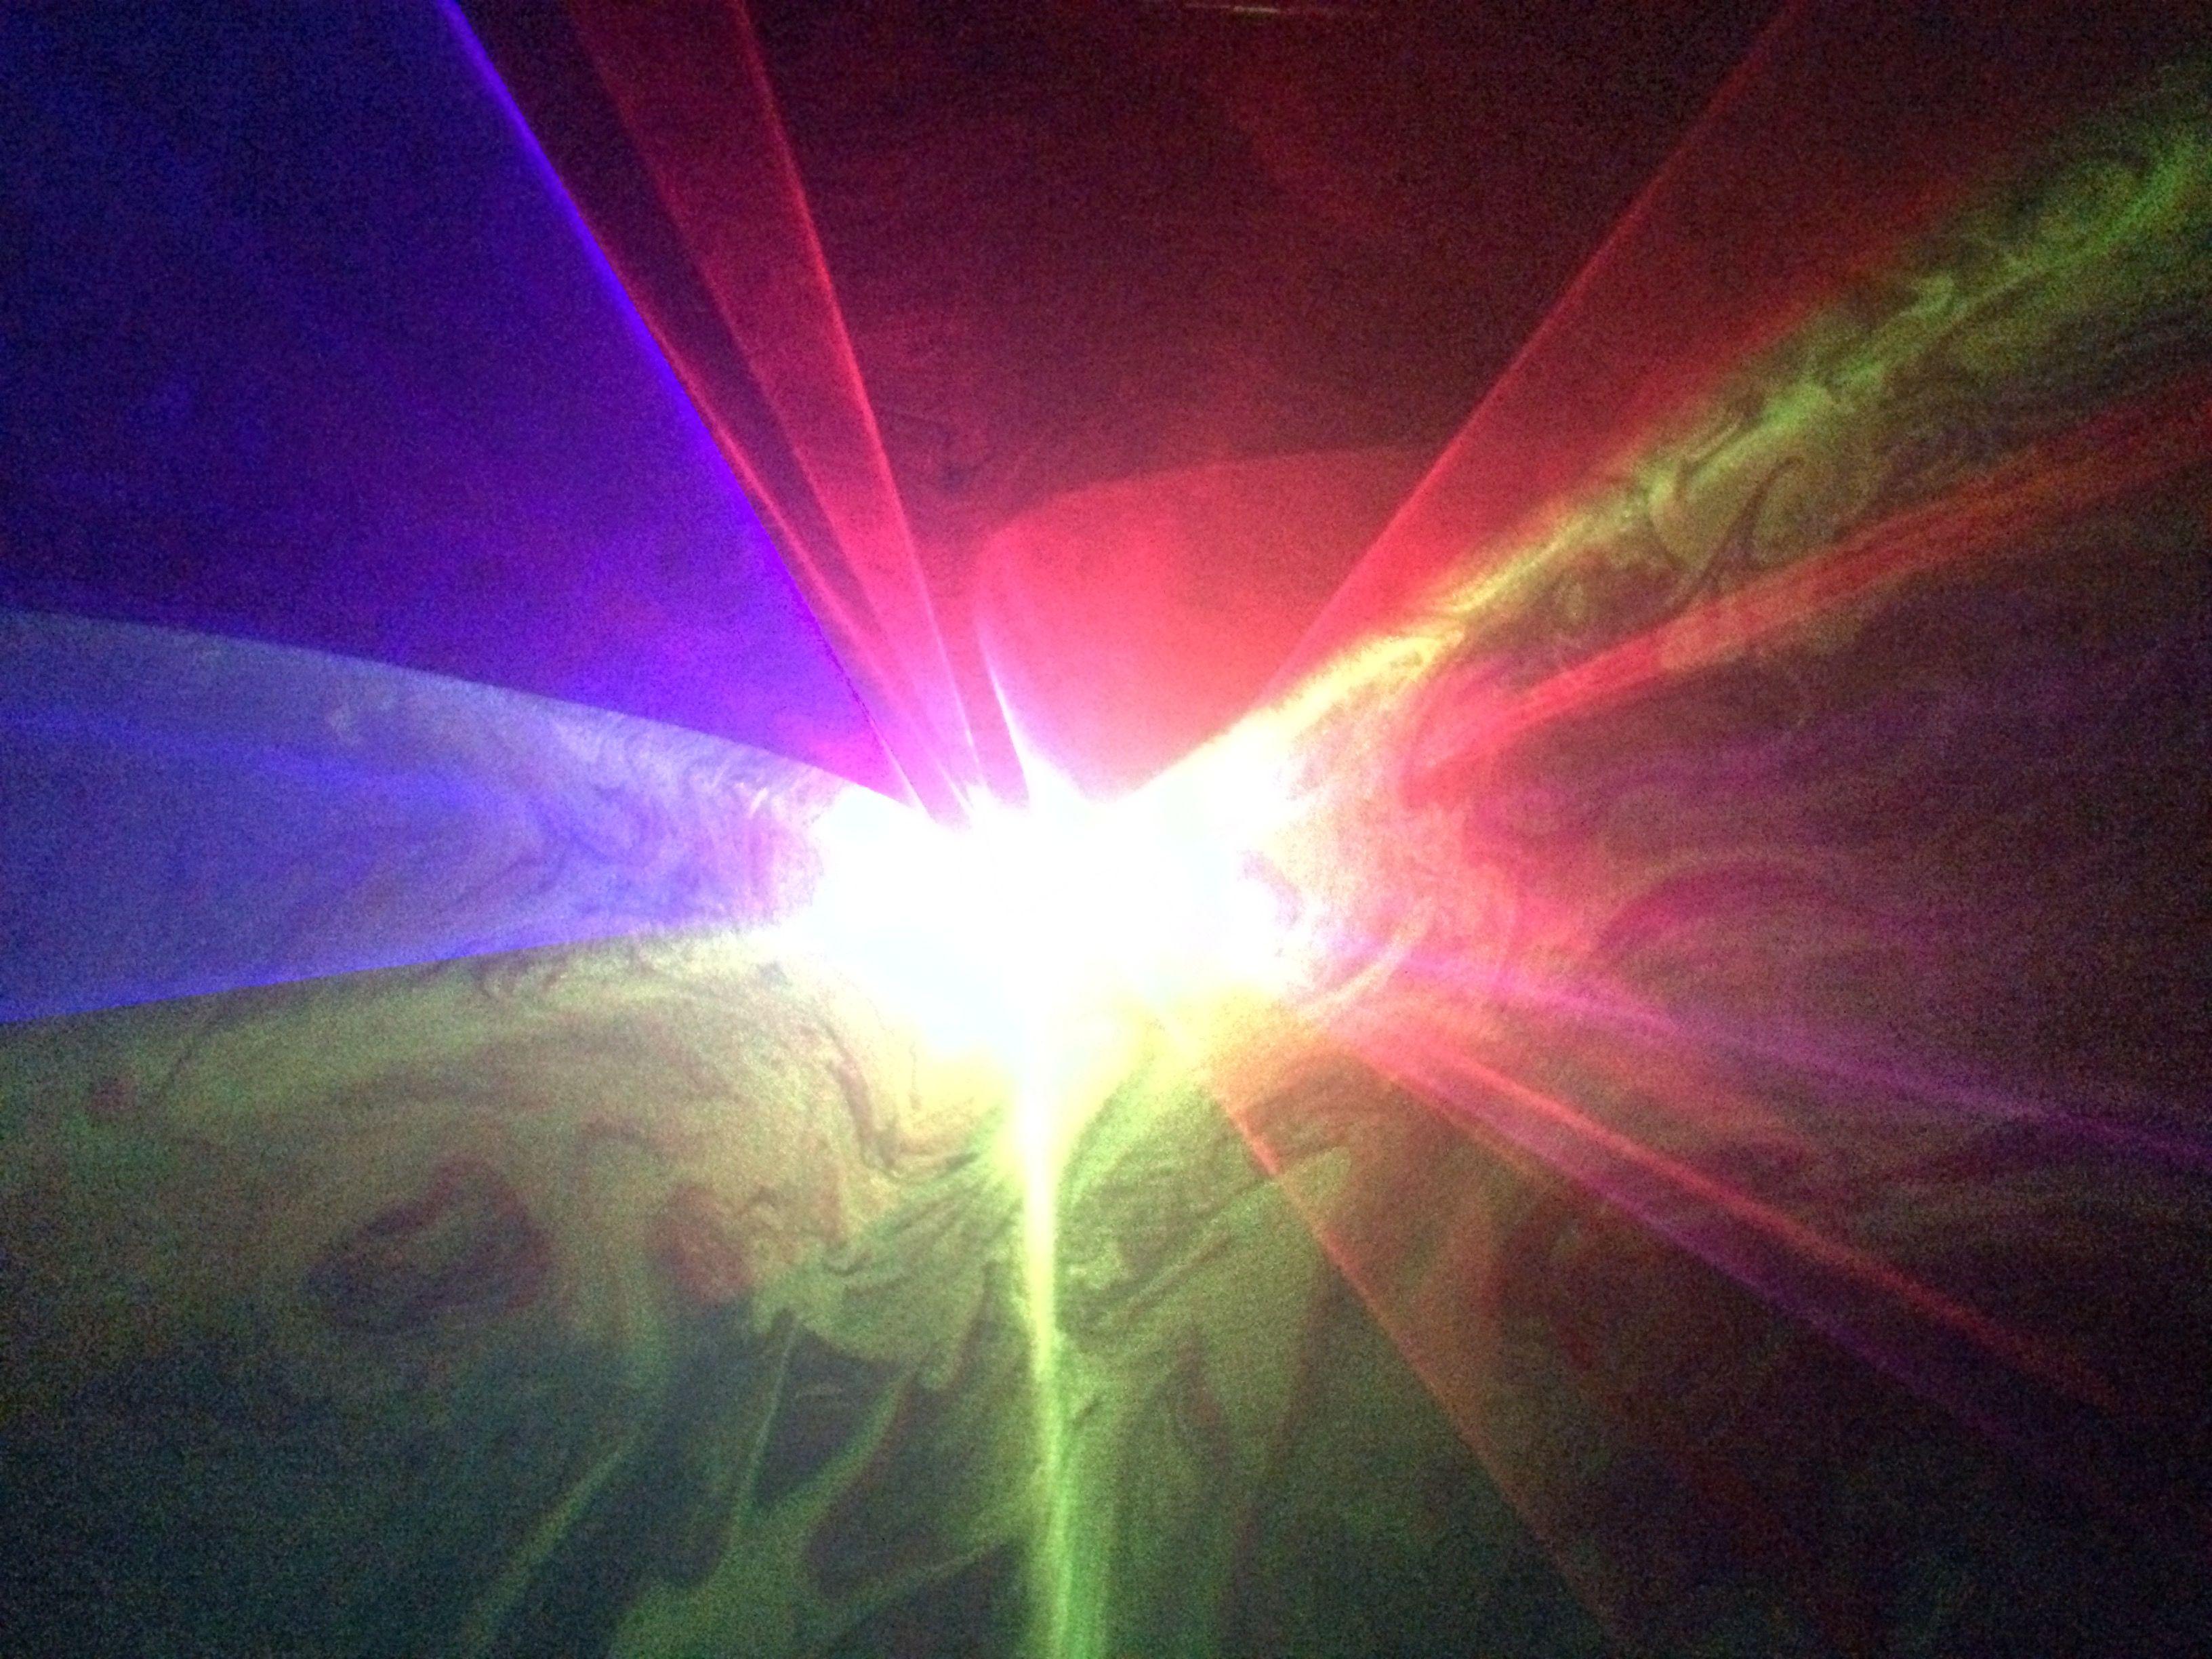 Full color RG 4 animated laser lights